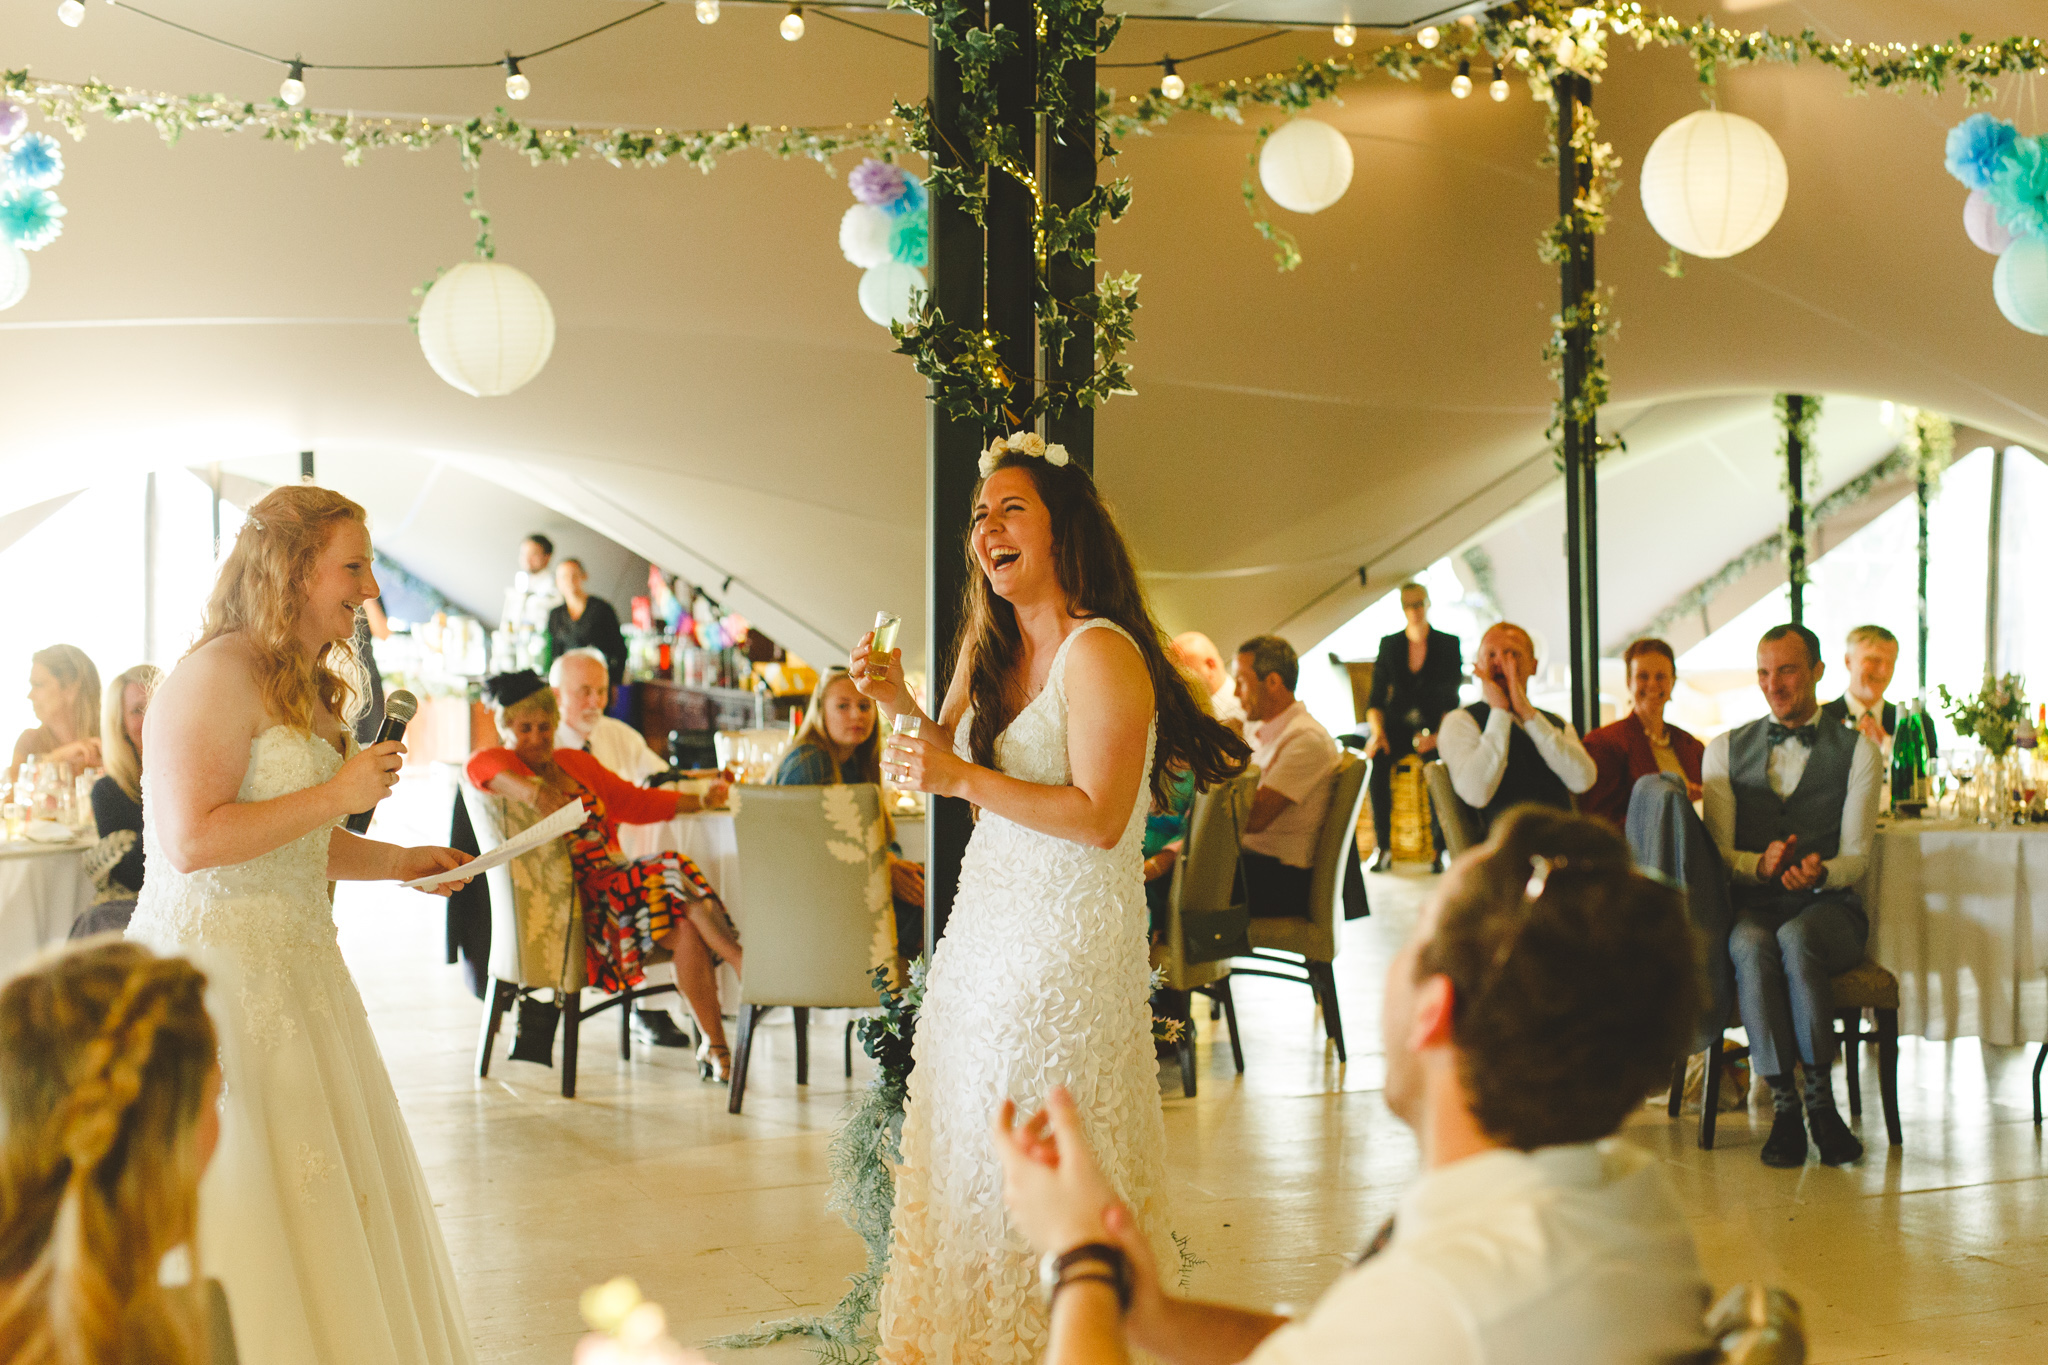 derbyshire-wedding-photographer-videographer-camera-hannah-14.jpg